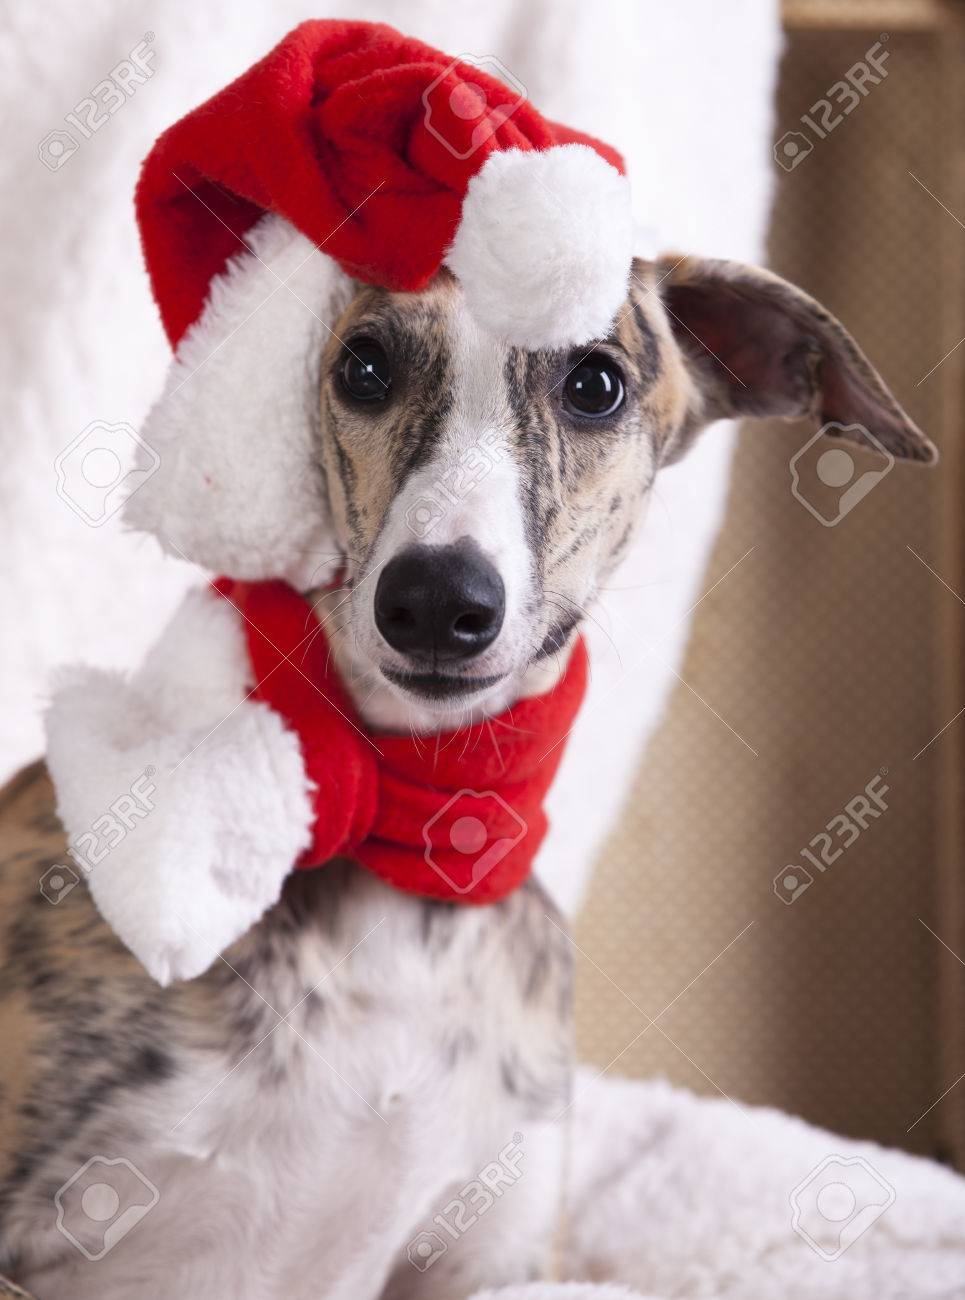 df802b286ed8a dog whippet wearing a santa hat Stock Photo - 34437277